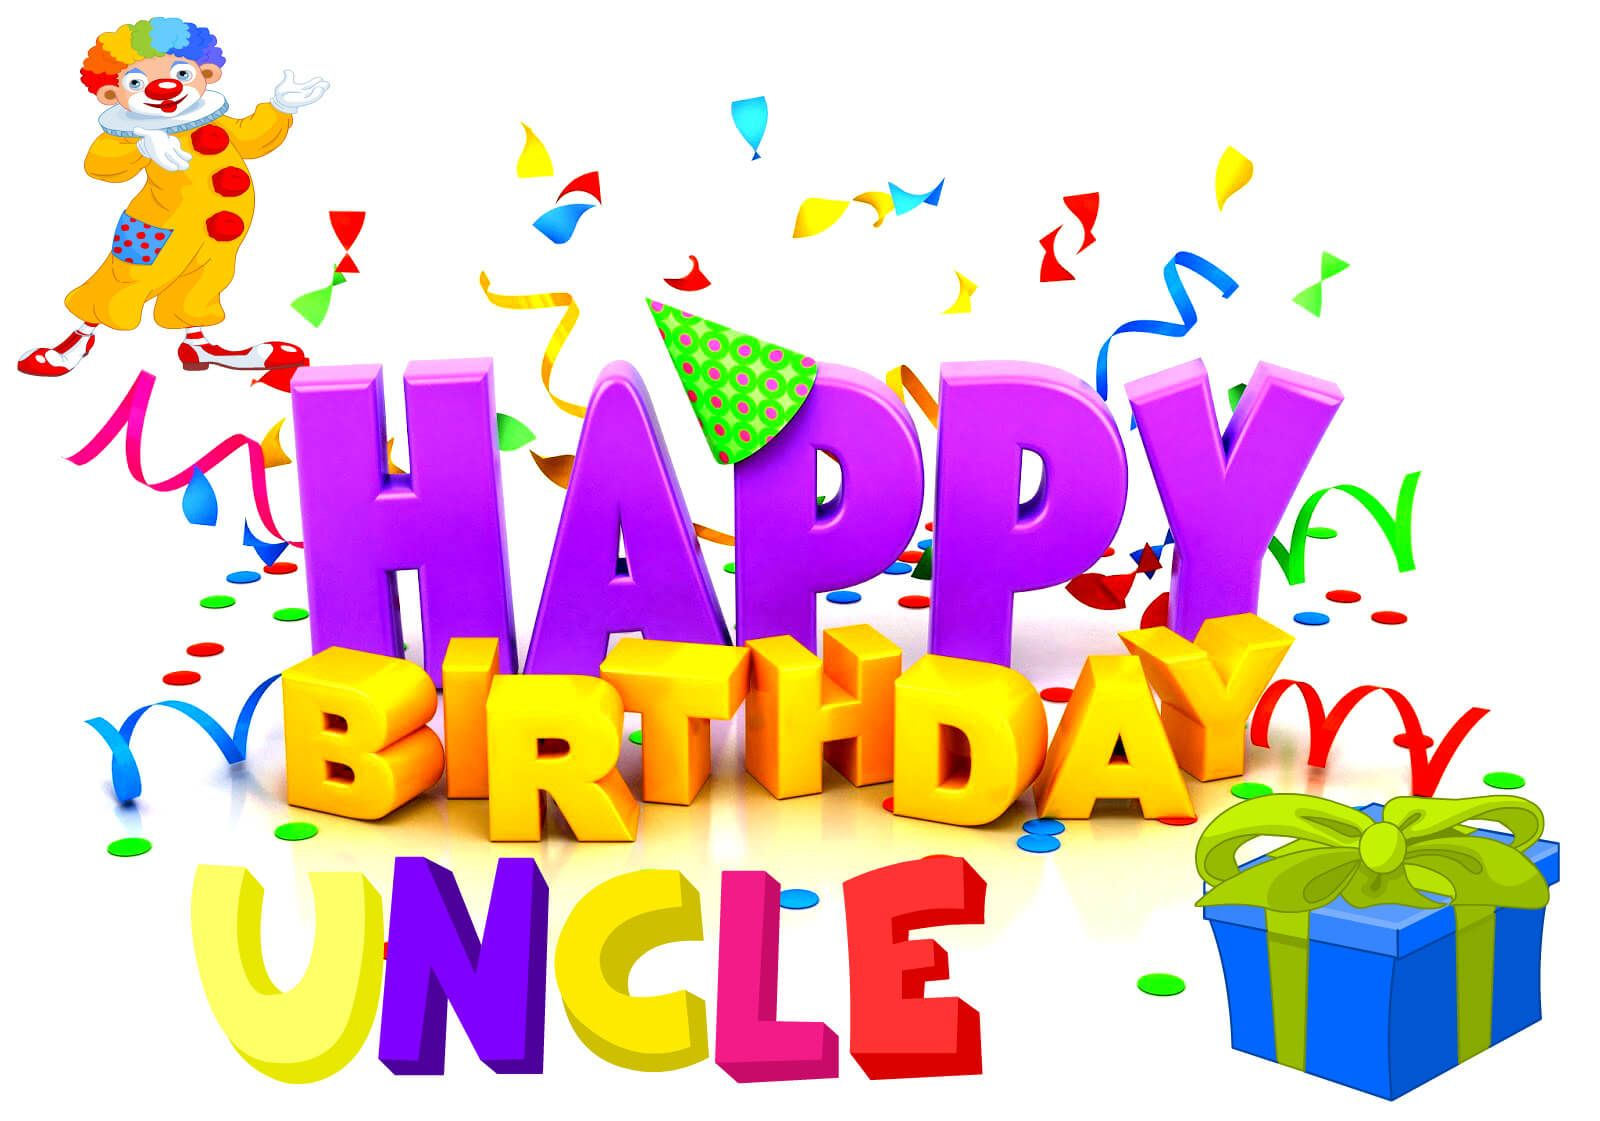 Happy birthday uncle funny happy birthday greeting cards birthday wishes for uncle uncle birthday quotes birthday cards for uncle happy birthday uncle funny funny birthday wishes for uncle m4hsunfo